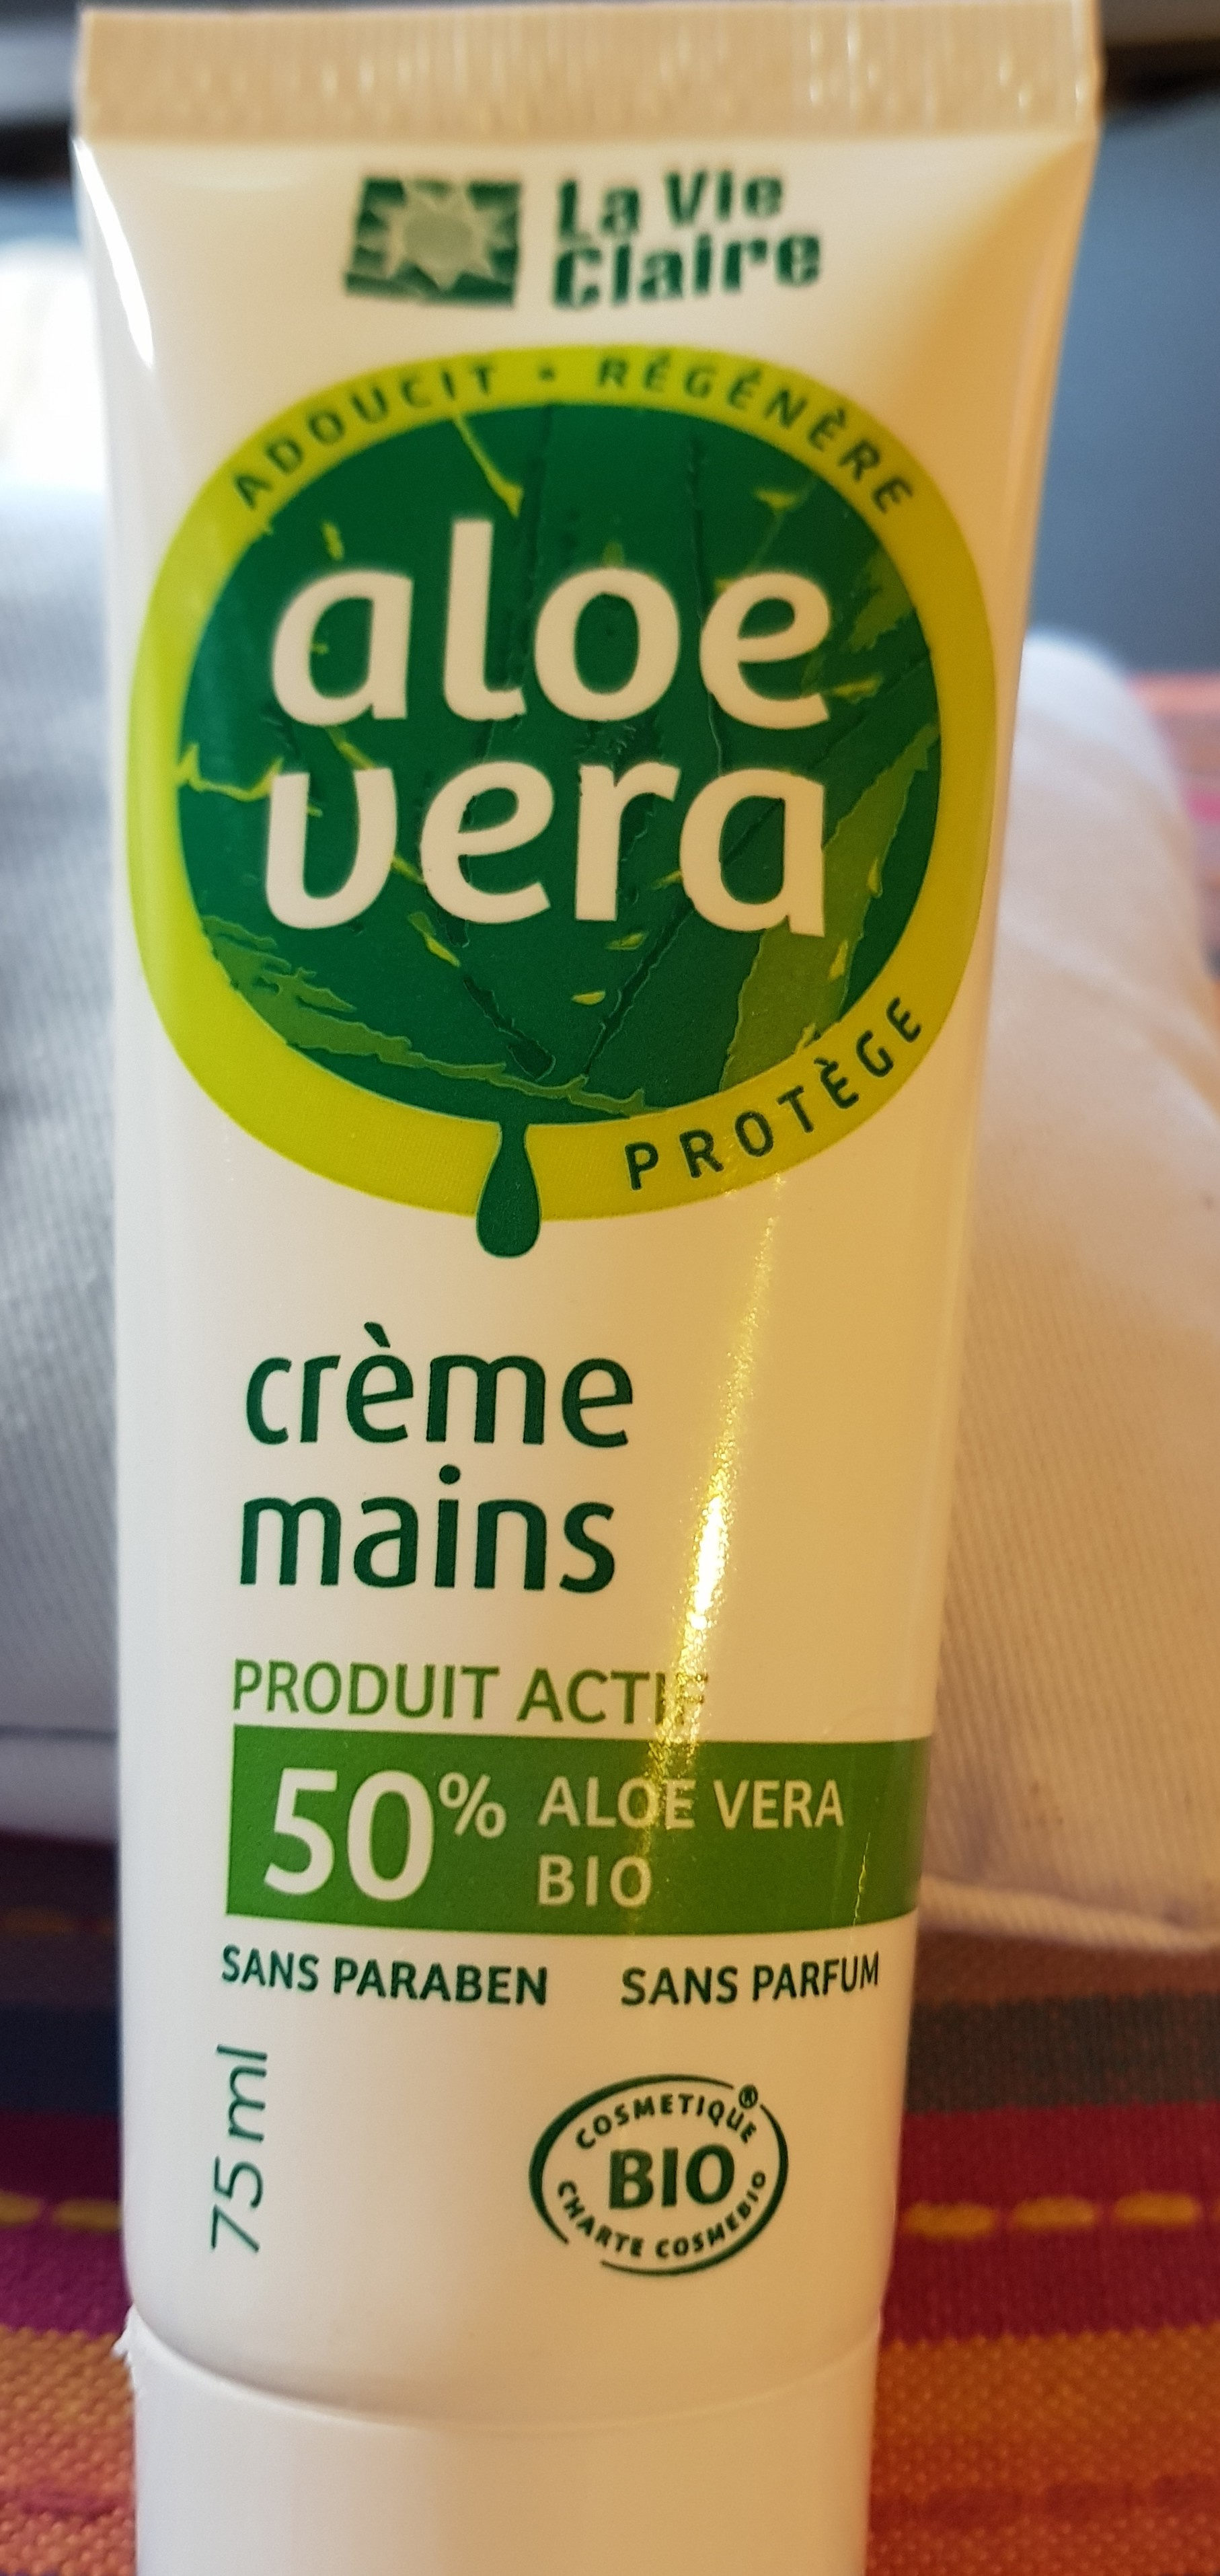 crème mains aloe vera - Product - fr